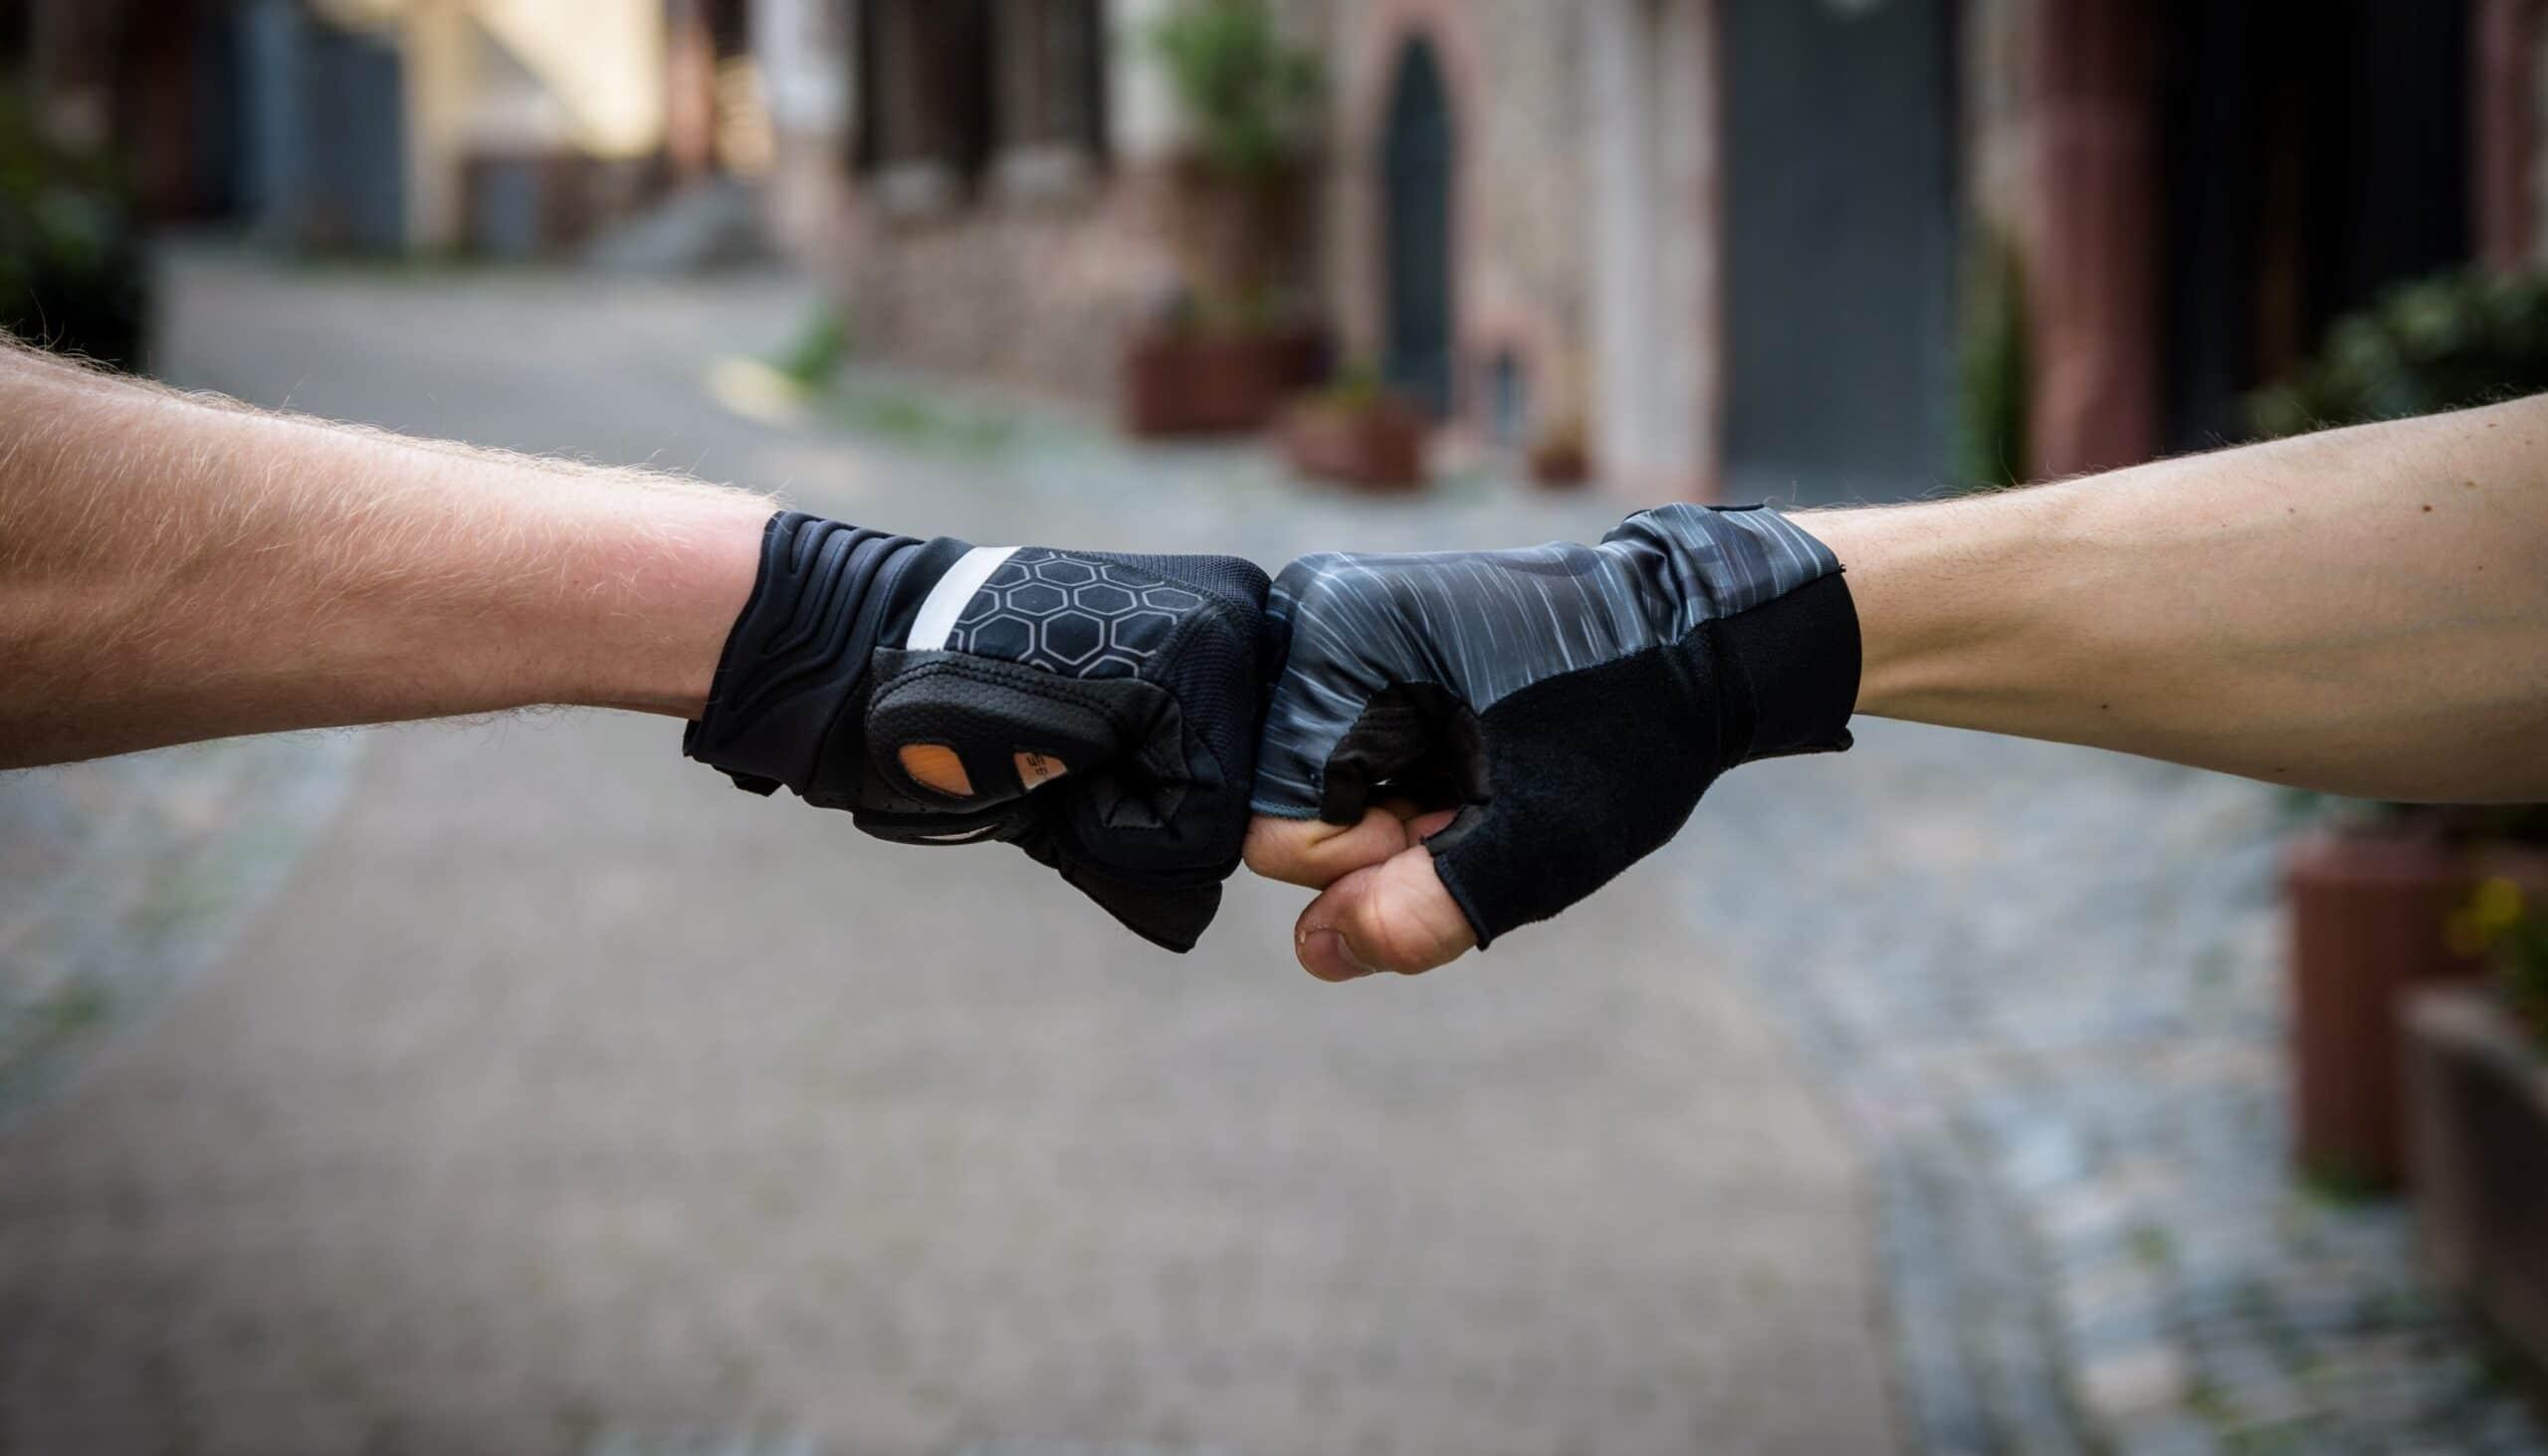 Roeckl Sports Handschuhe: BI-FUSION im Test